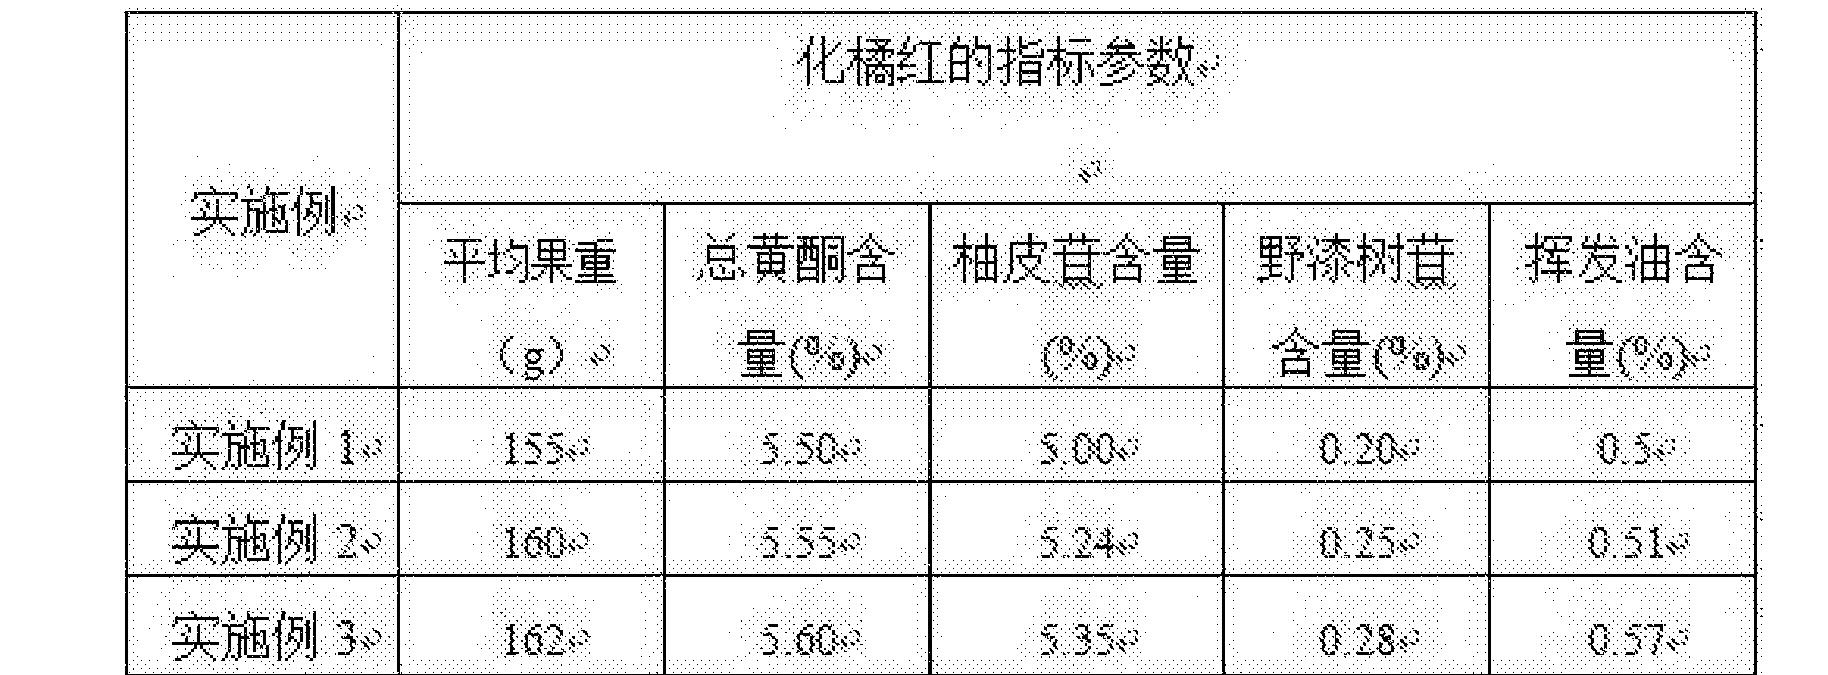 Figure CN105941048AD00131